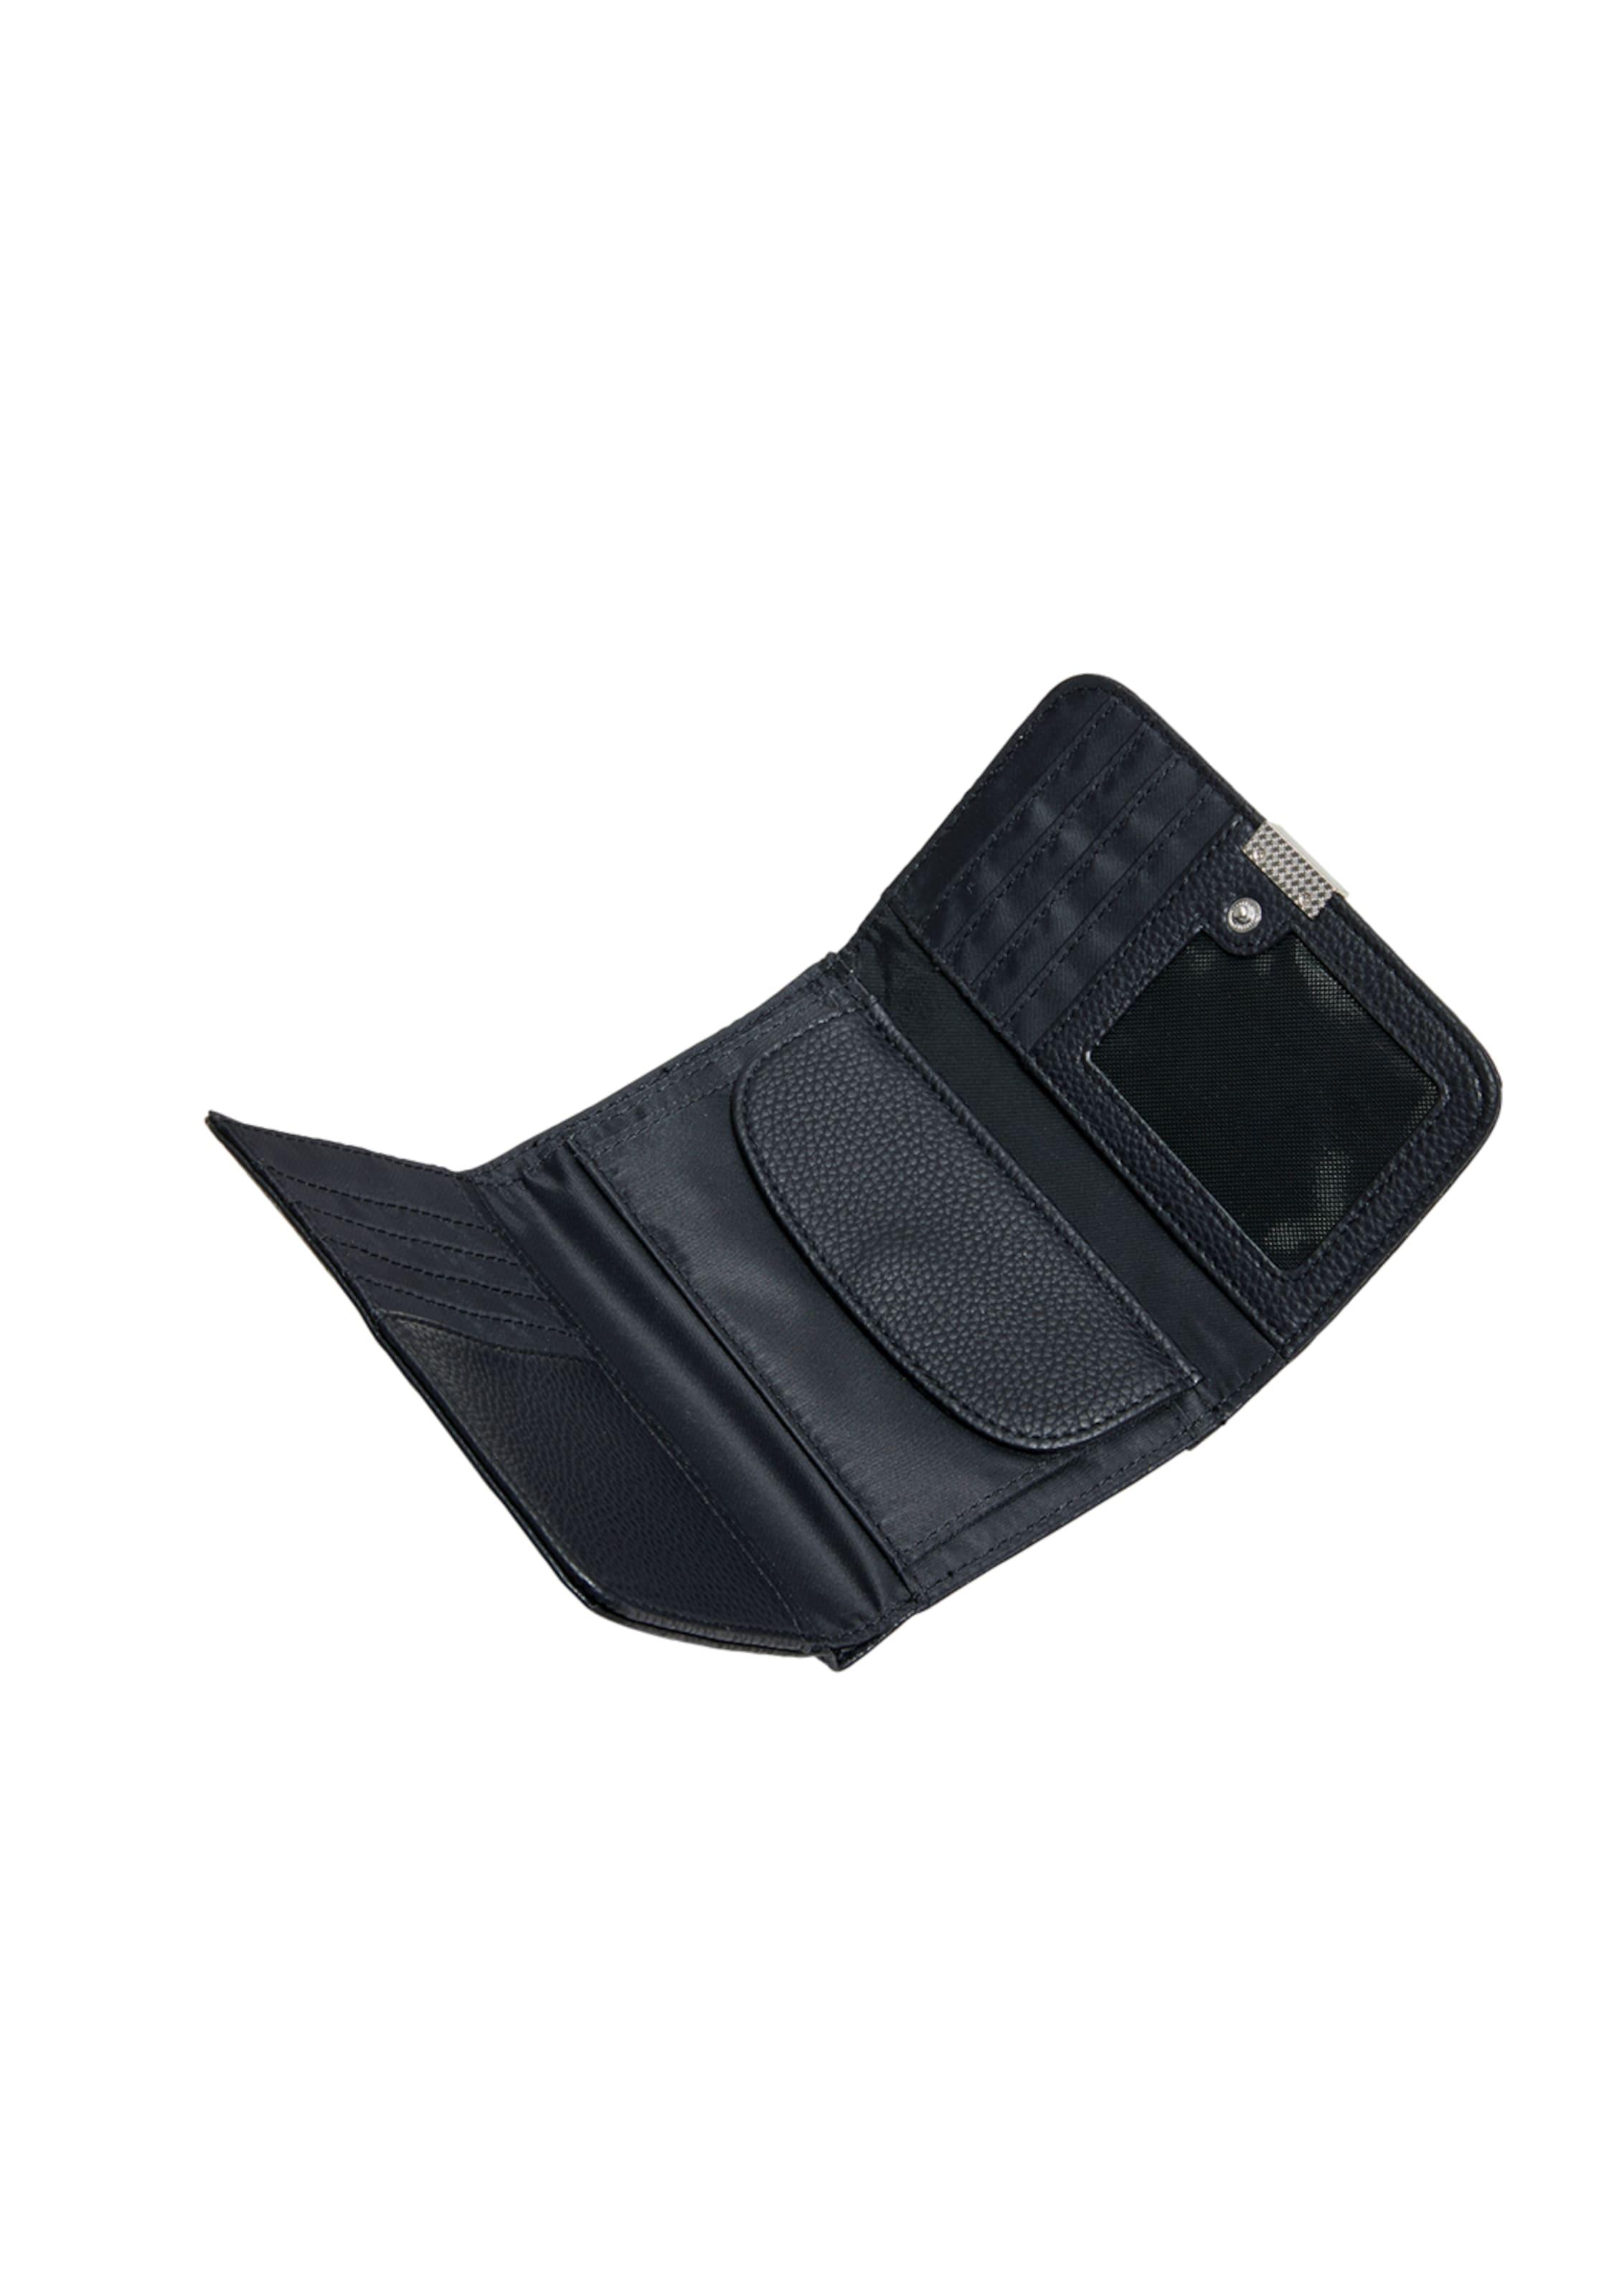 S Mit Wallet Schwarz oliver In Flap Struktur fI7v6byYgm